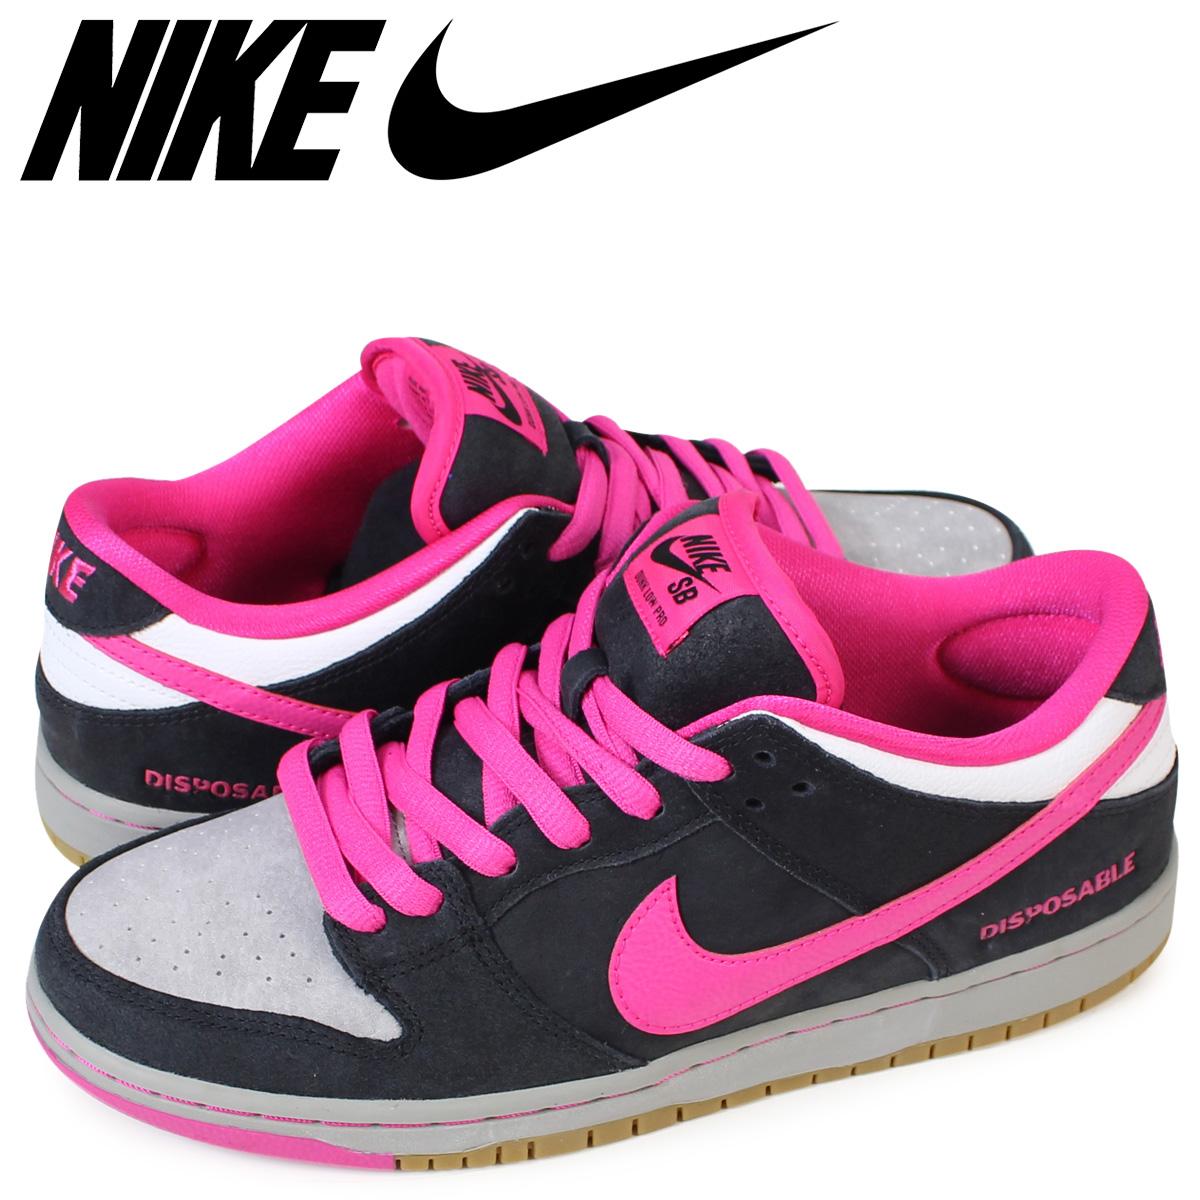 newest a26f0 b752e NIKE Nike SB dunk low sneakers DUNK LOW PREMIUM QS 504,750-061 men's black  black